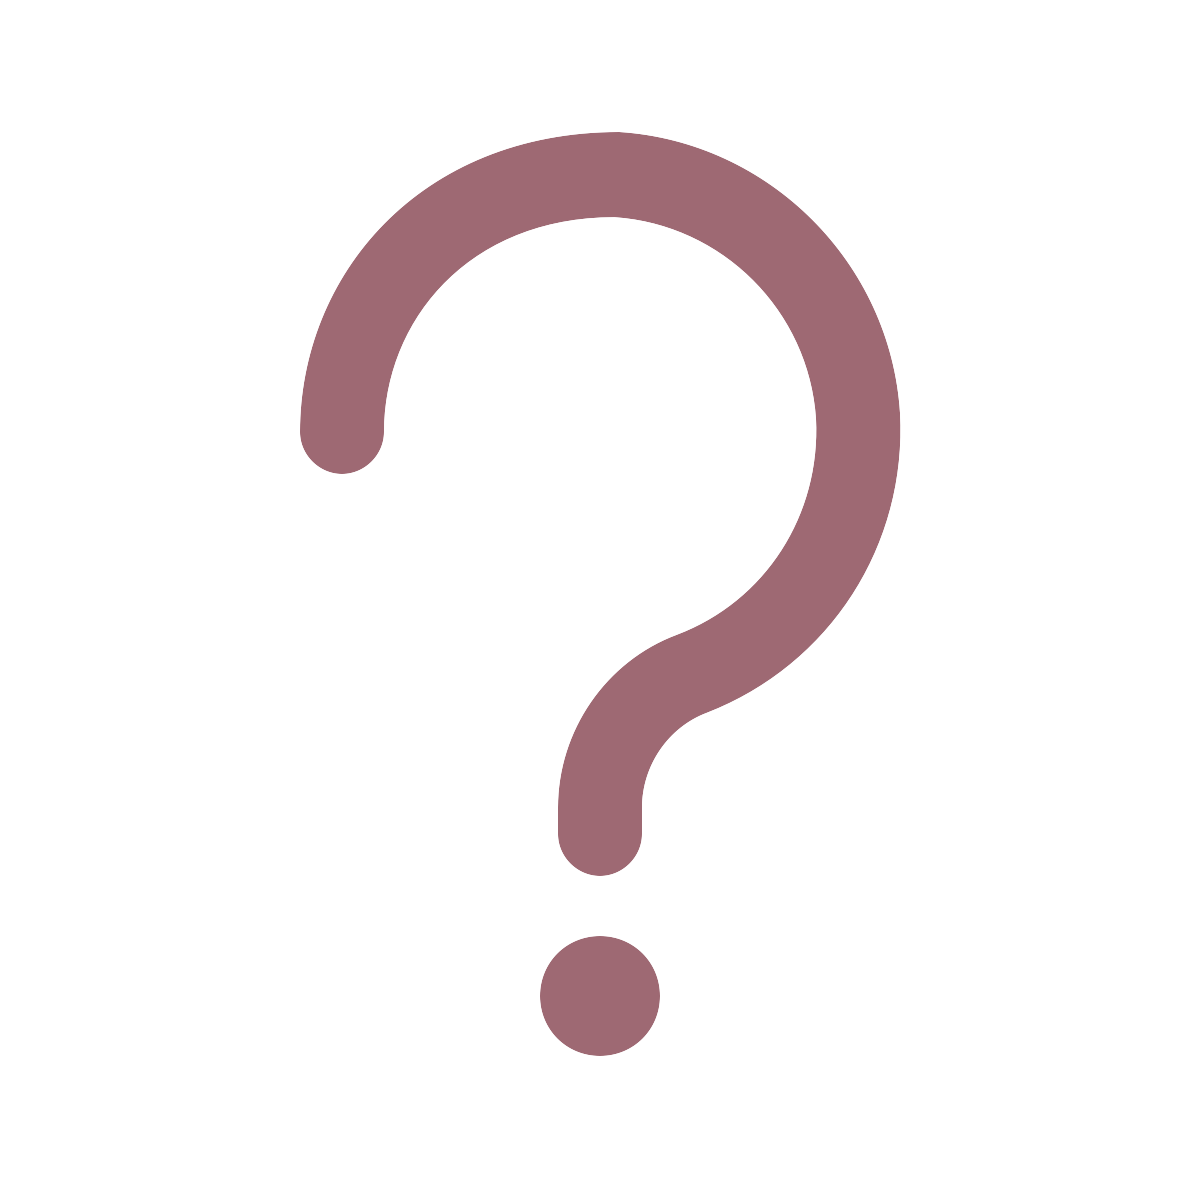 FAQs - See FAQs below